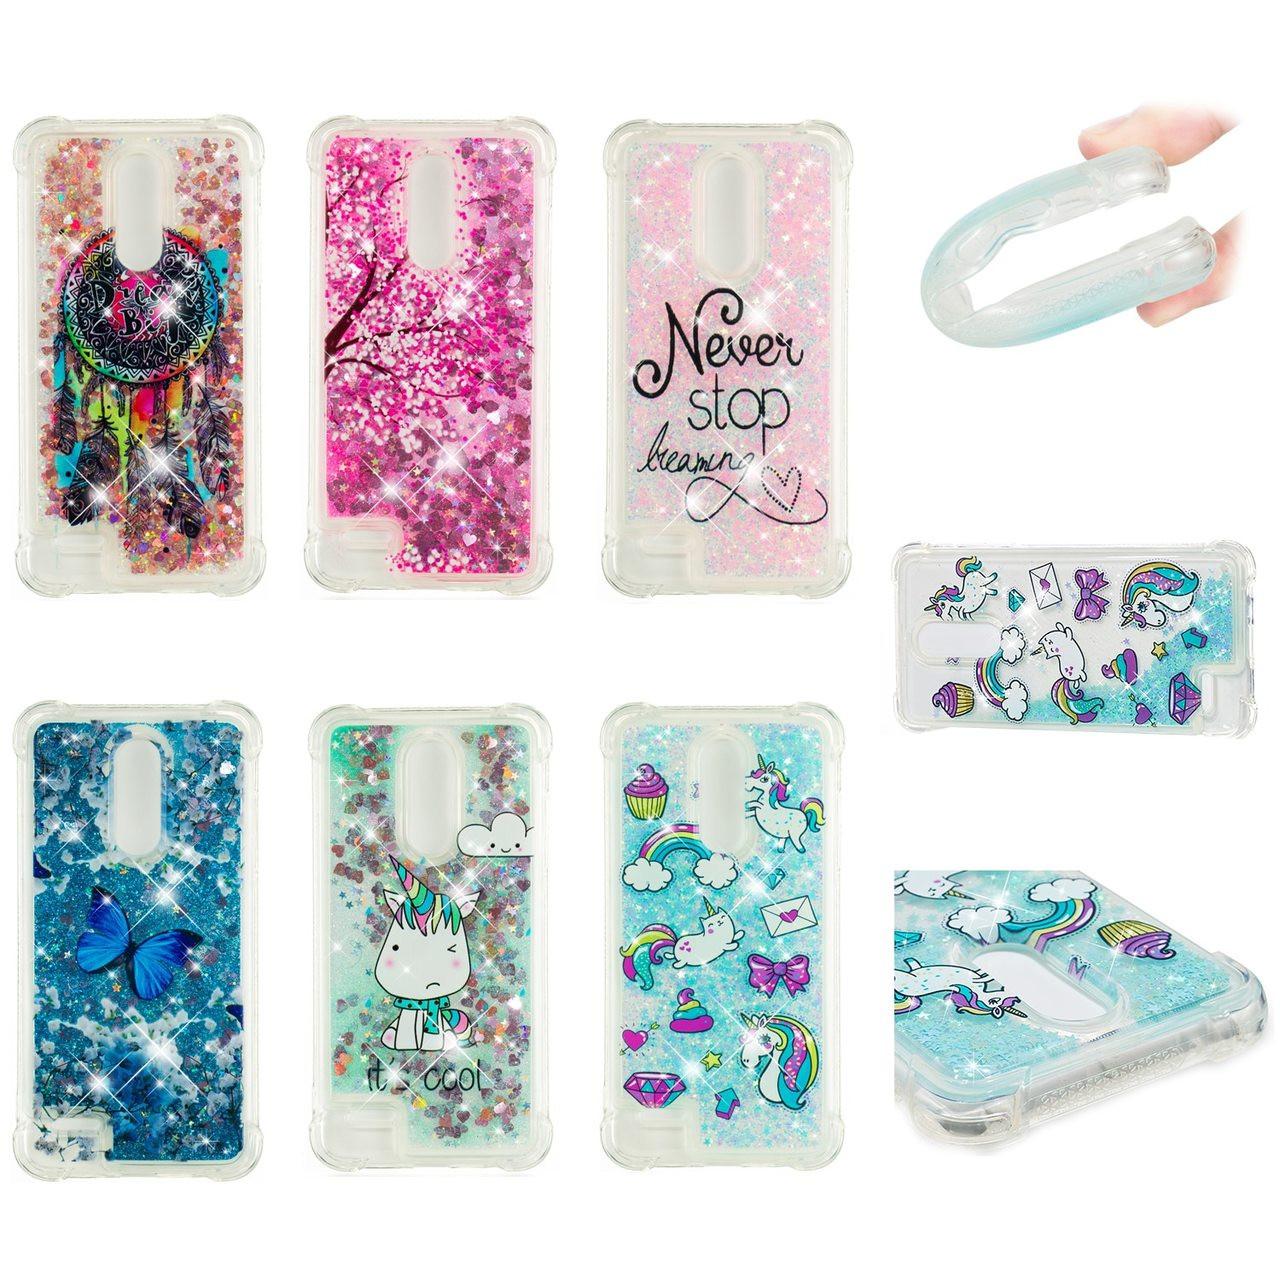 Water Liquid Case for LG K4 K8 K10 2017 2018 STYLO 3PLUS V20 V30 Unicorn  Horse Sparkle Quicksand Shockproof TPU Cover Phone Case - OnshopDeals.Com 8f566fcc7